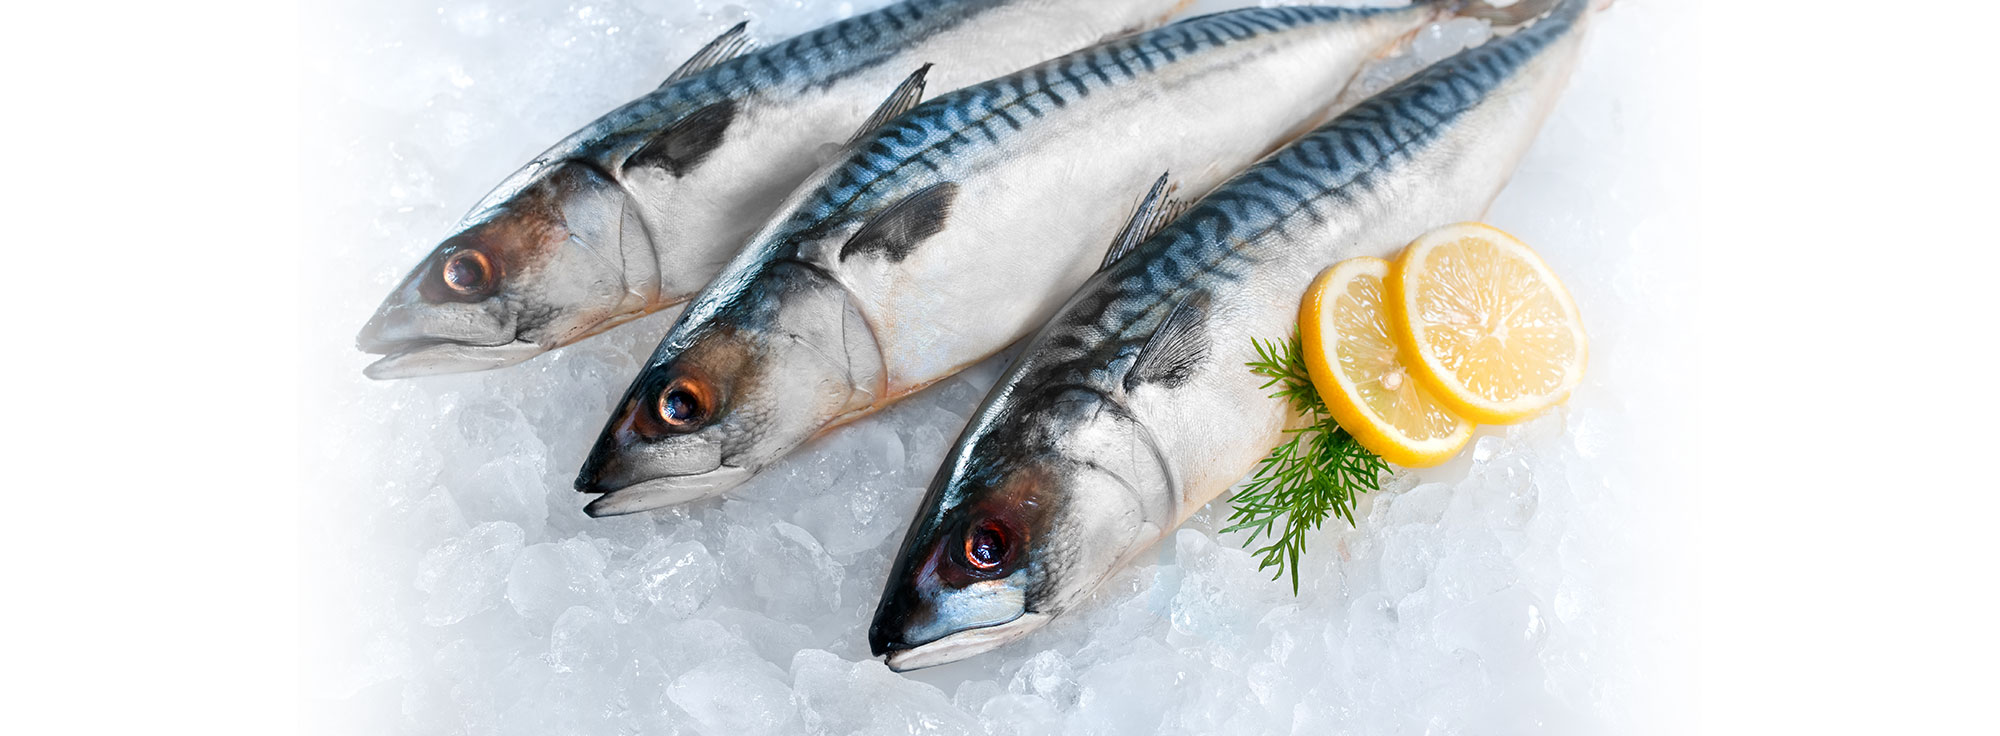 herring 2018 rostock